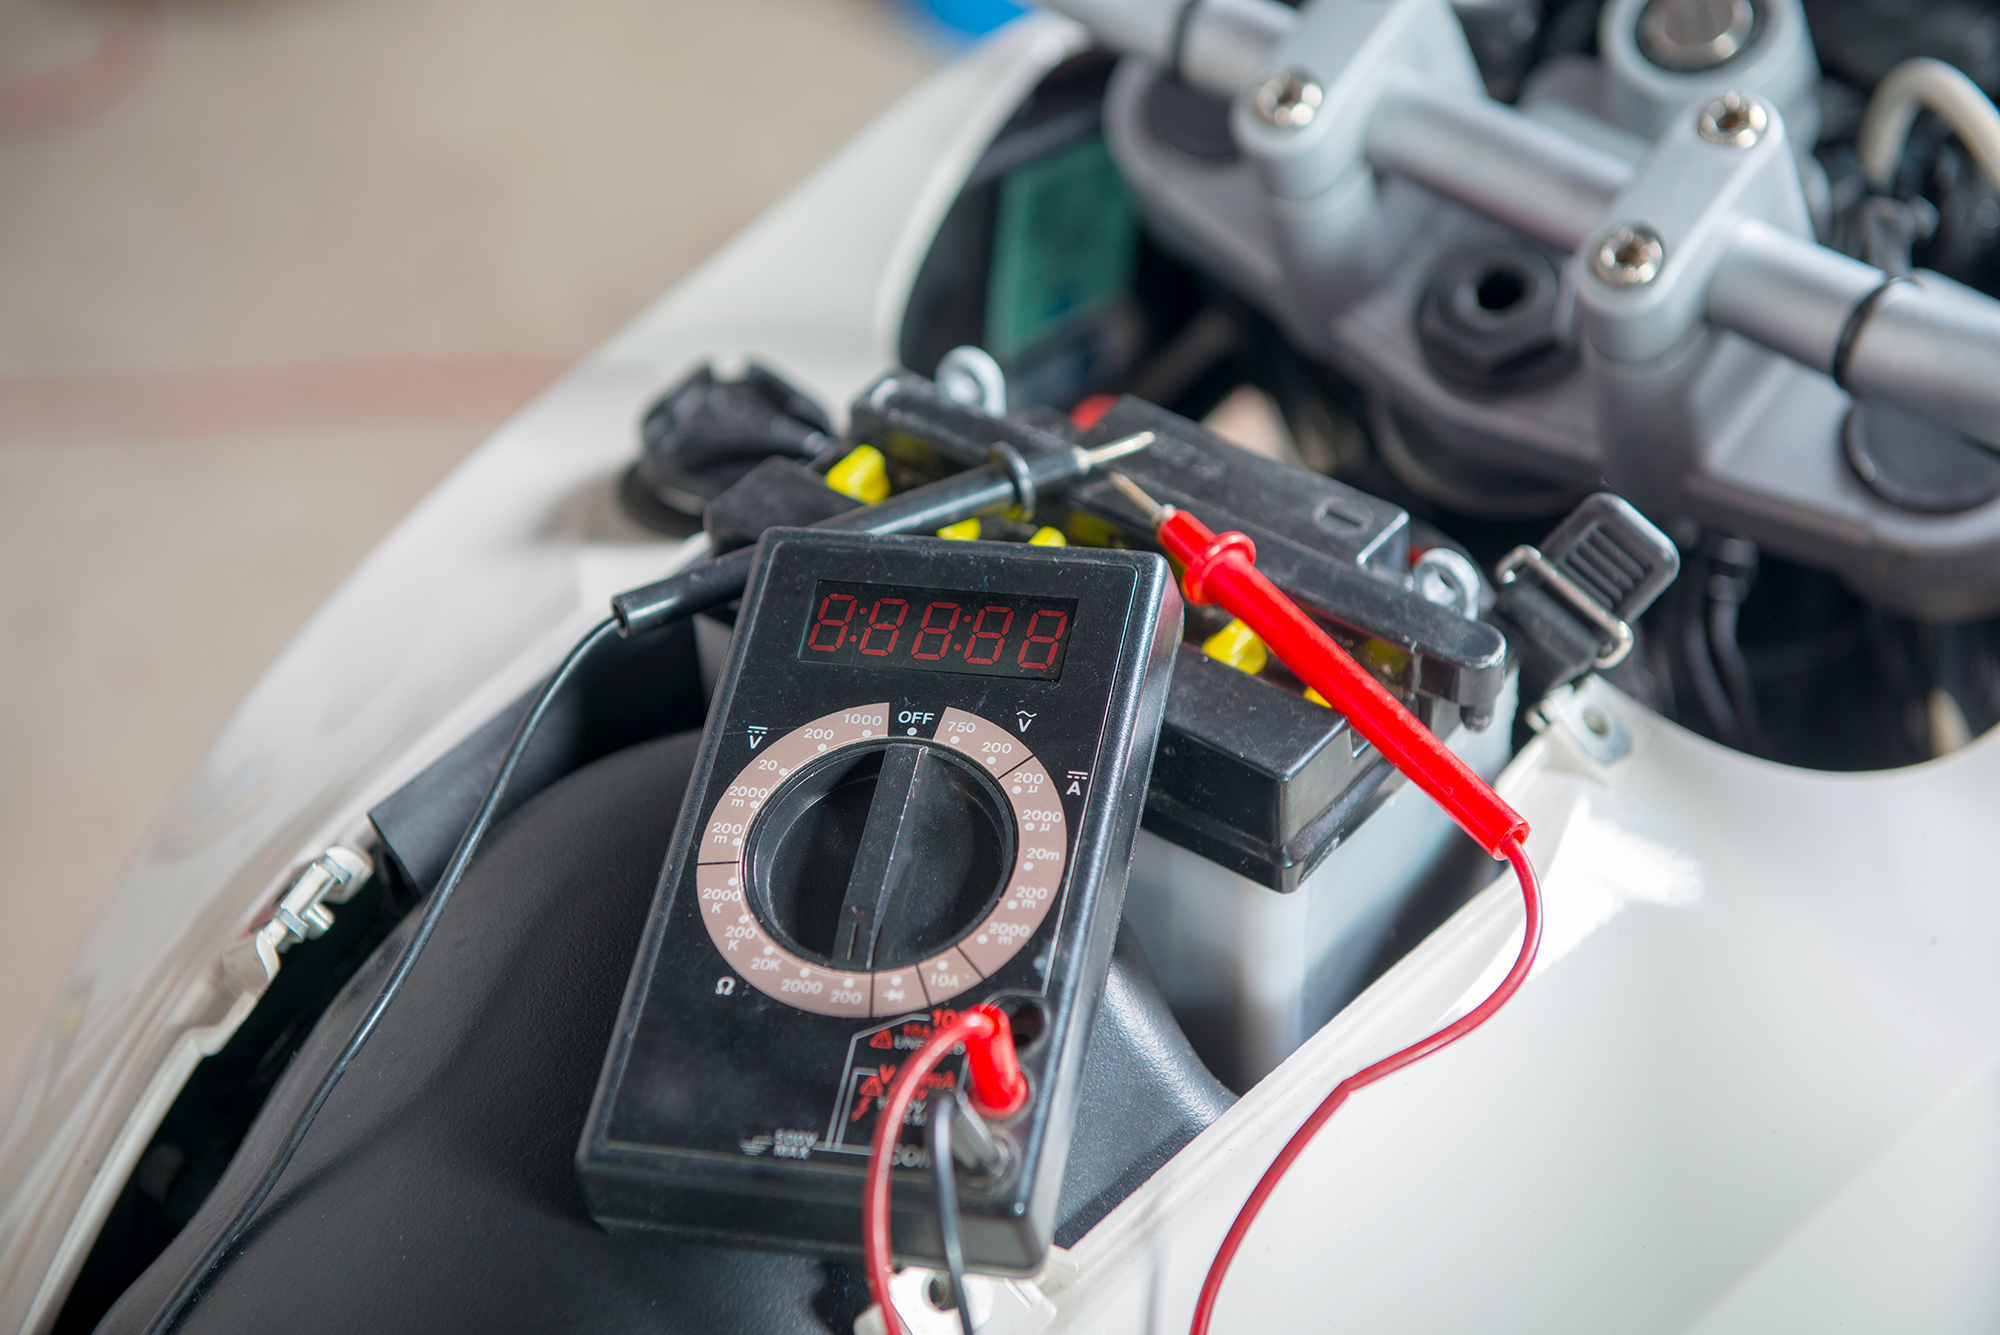 verifier-changer-sa-batterie-moto